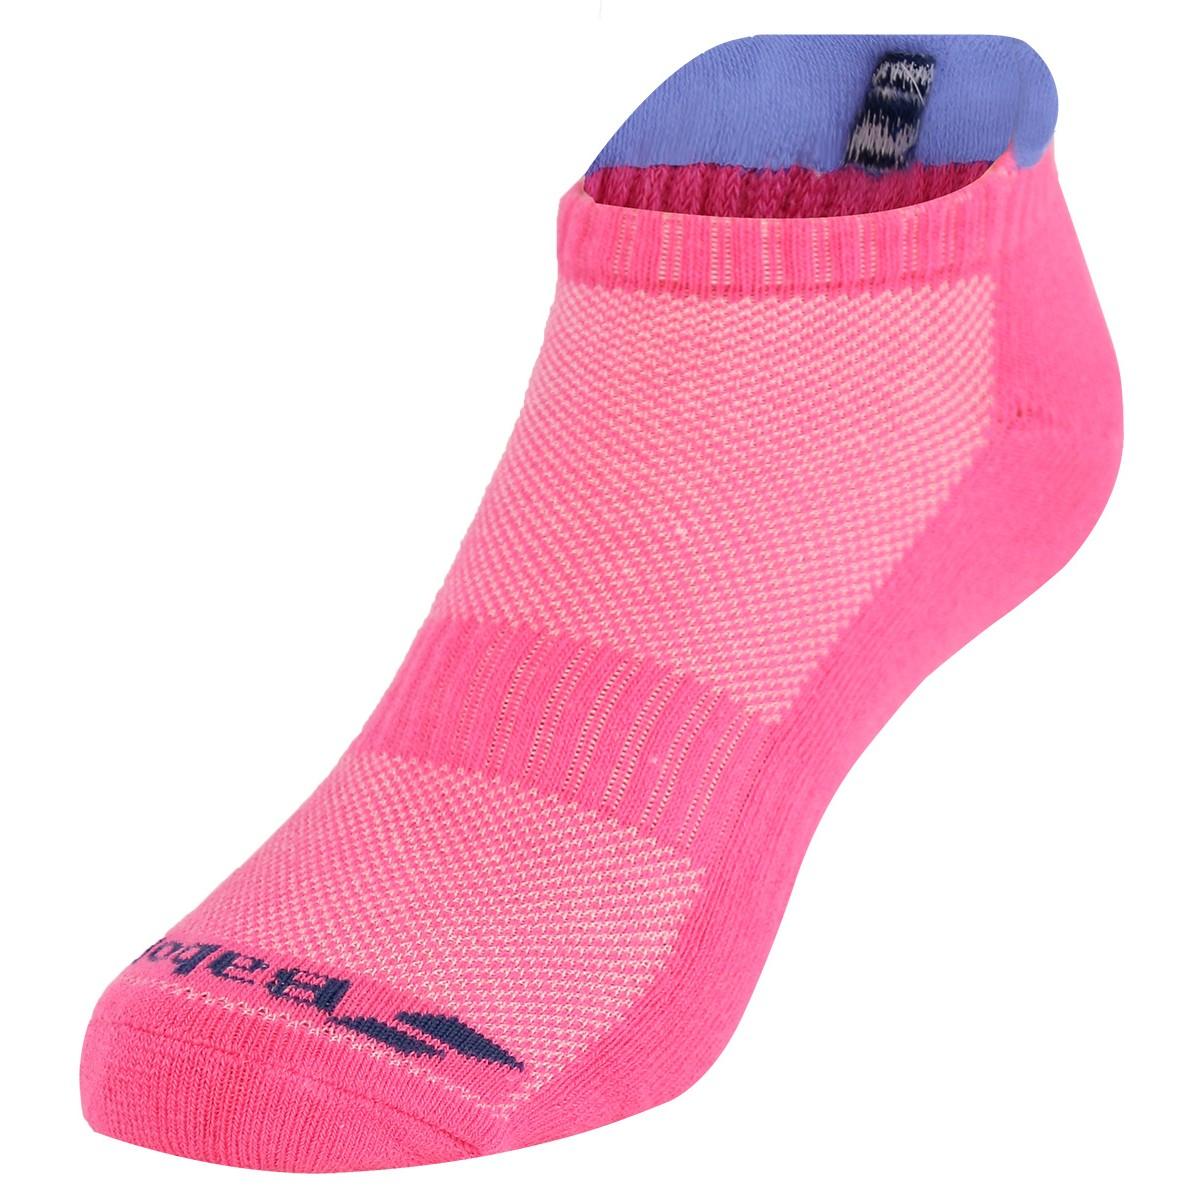 Babolat 2 pares Calcetines de tenis invisibles para mujer